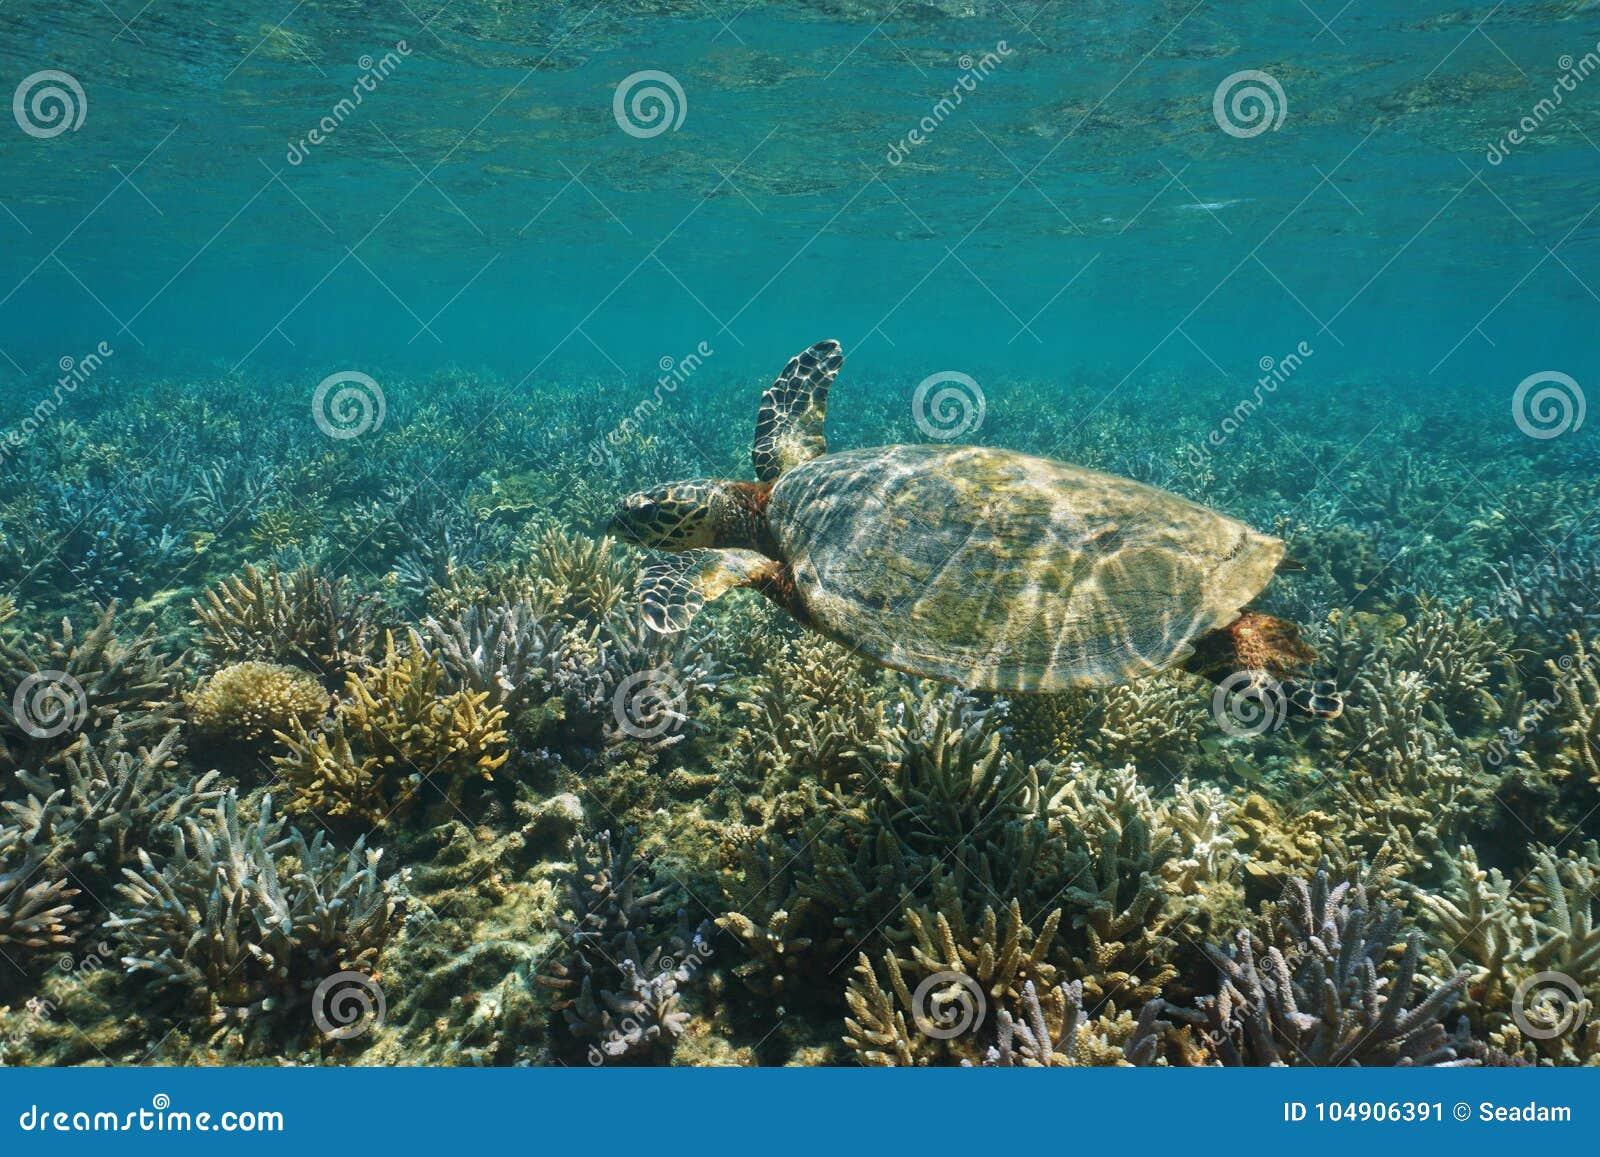 A hawksbill sea turtle Eretmochelys imbricata